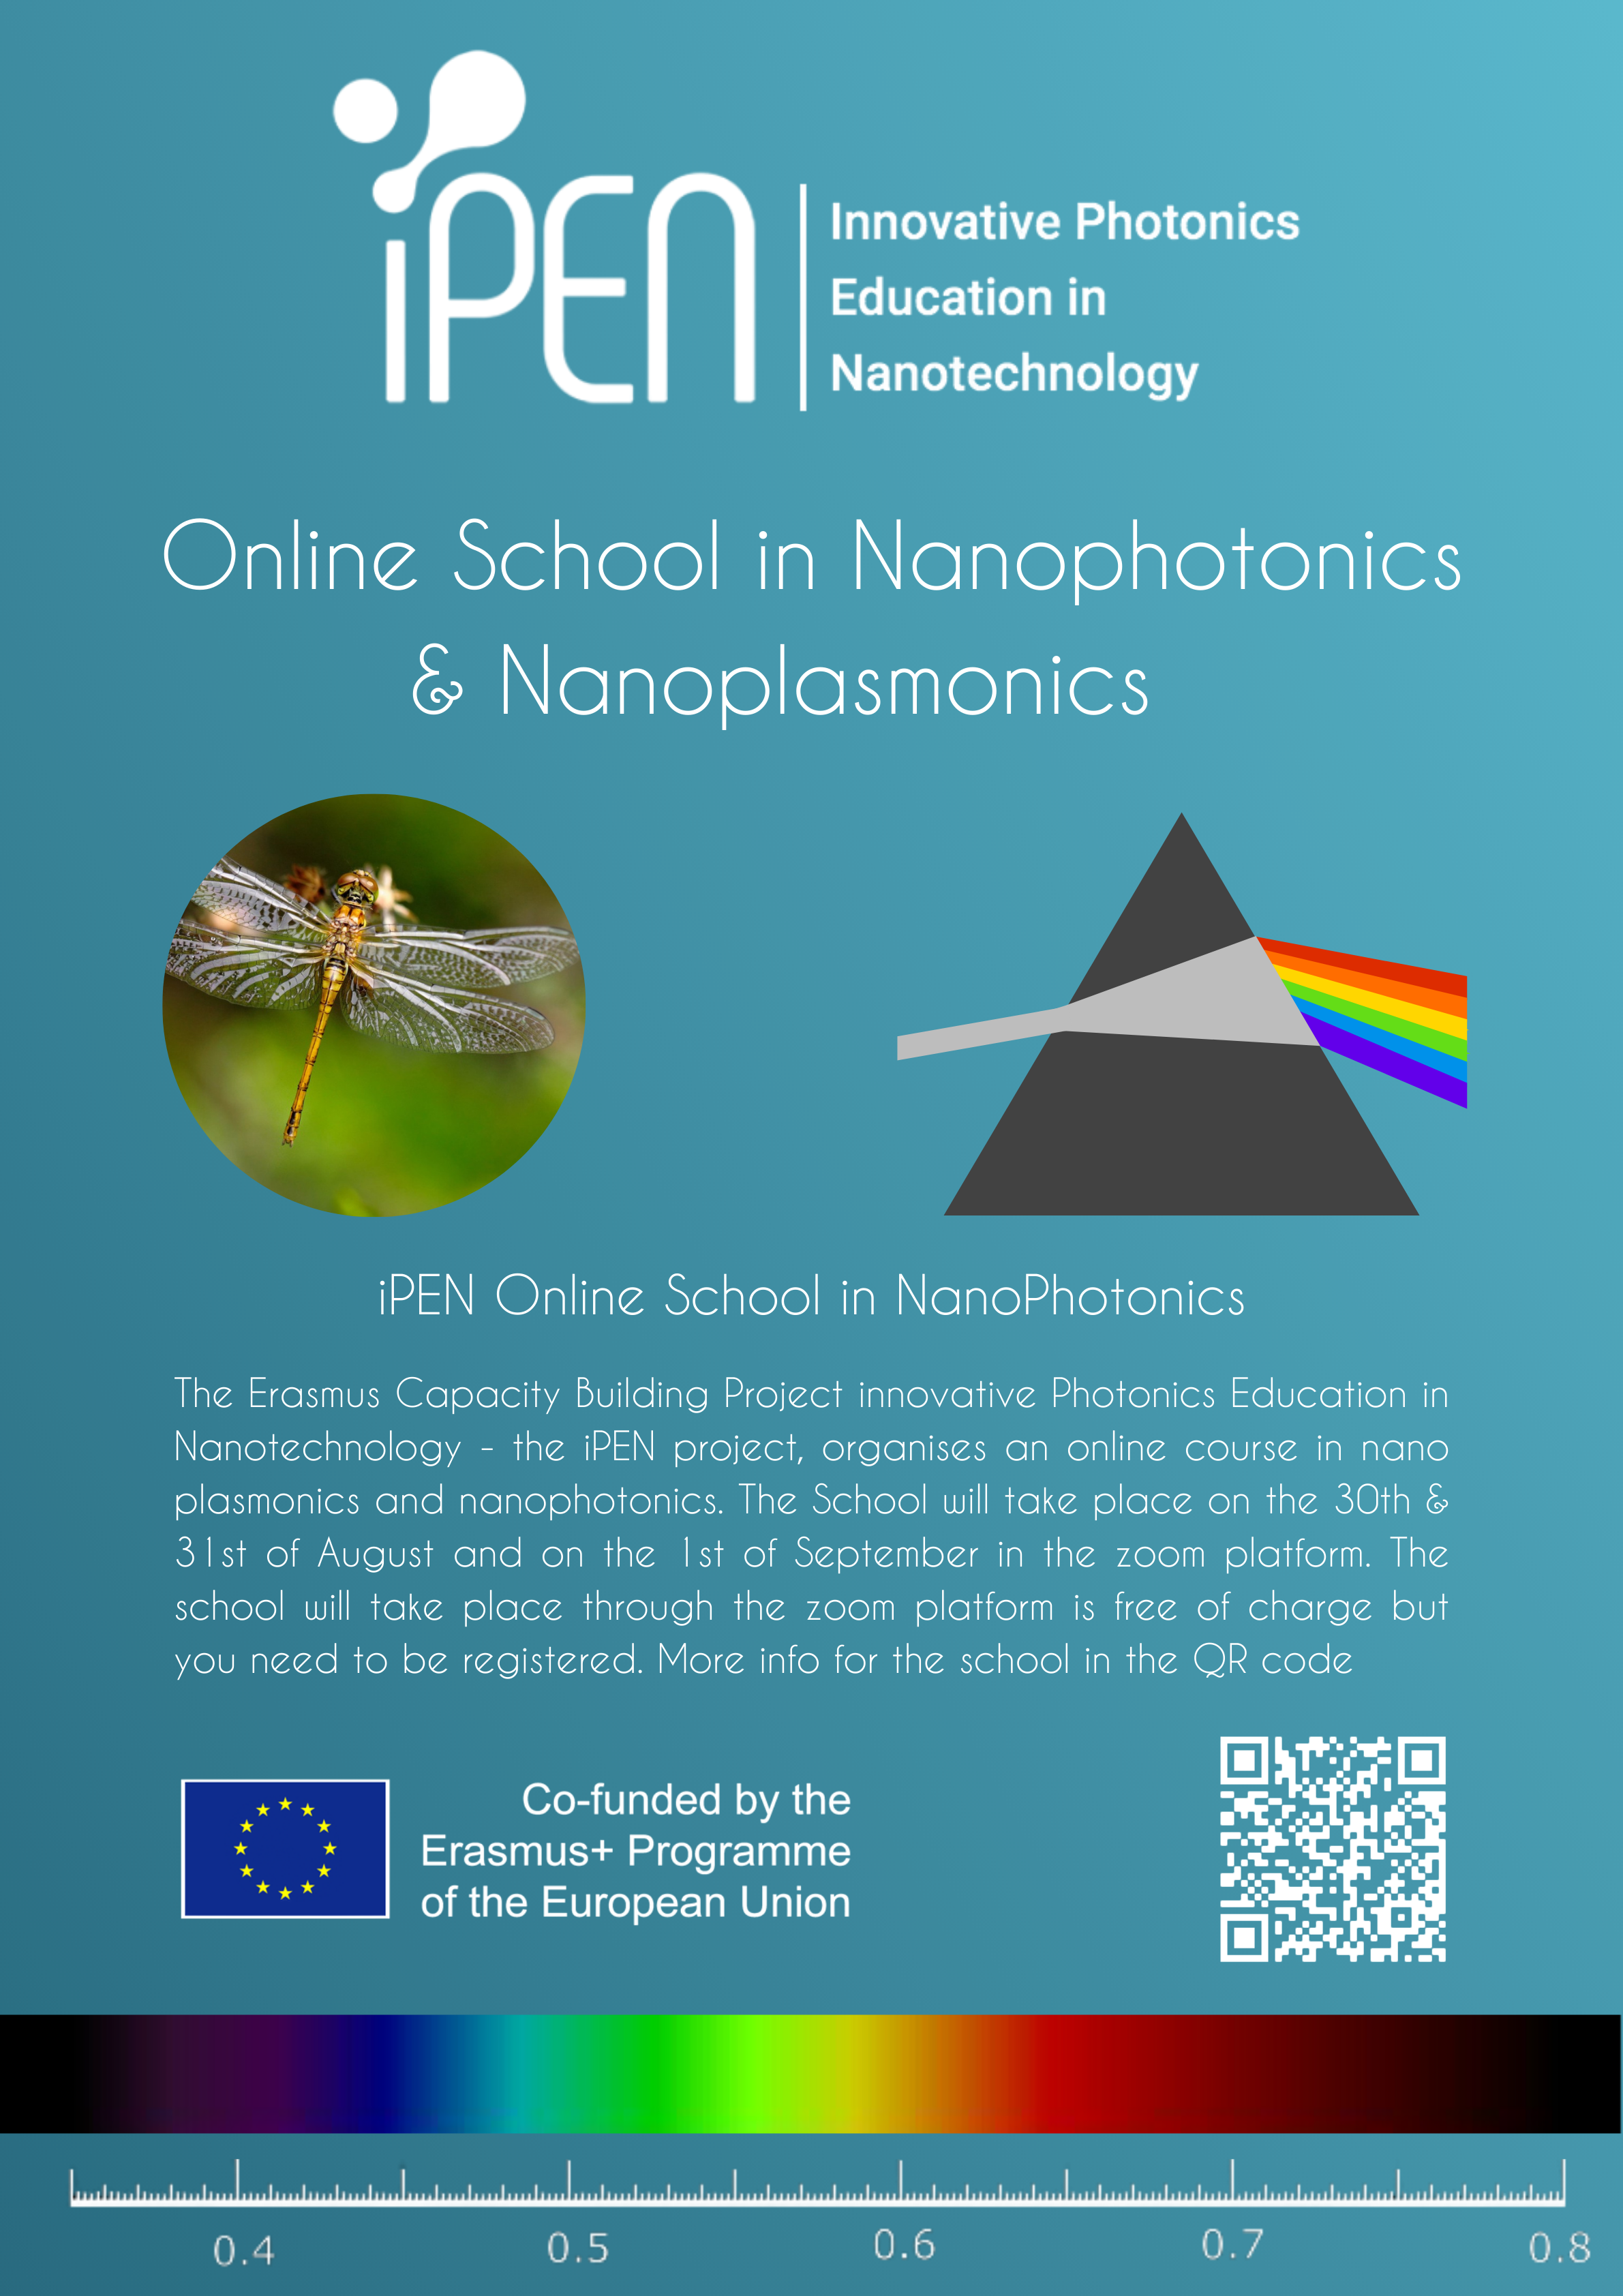 30/08 – 01/09/2021: Online School in Nanophotonics & Nanoplasmonics